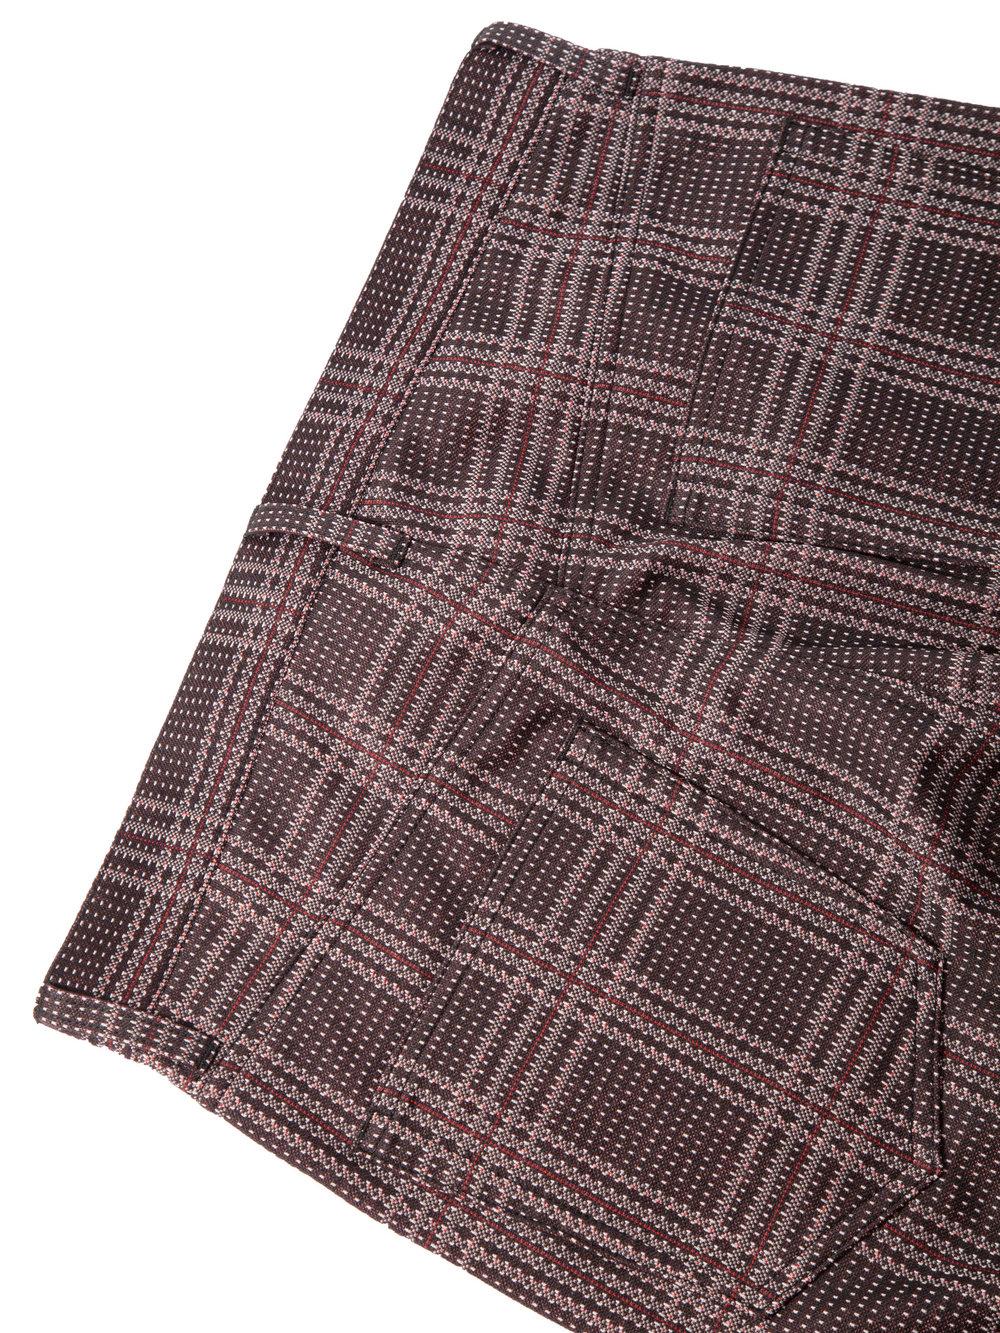 JUNYA_WATANABE_5_Pkt_Patterned_Trouser-3.jpg